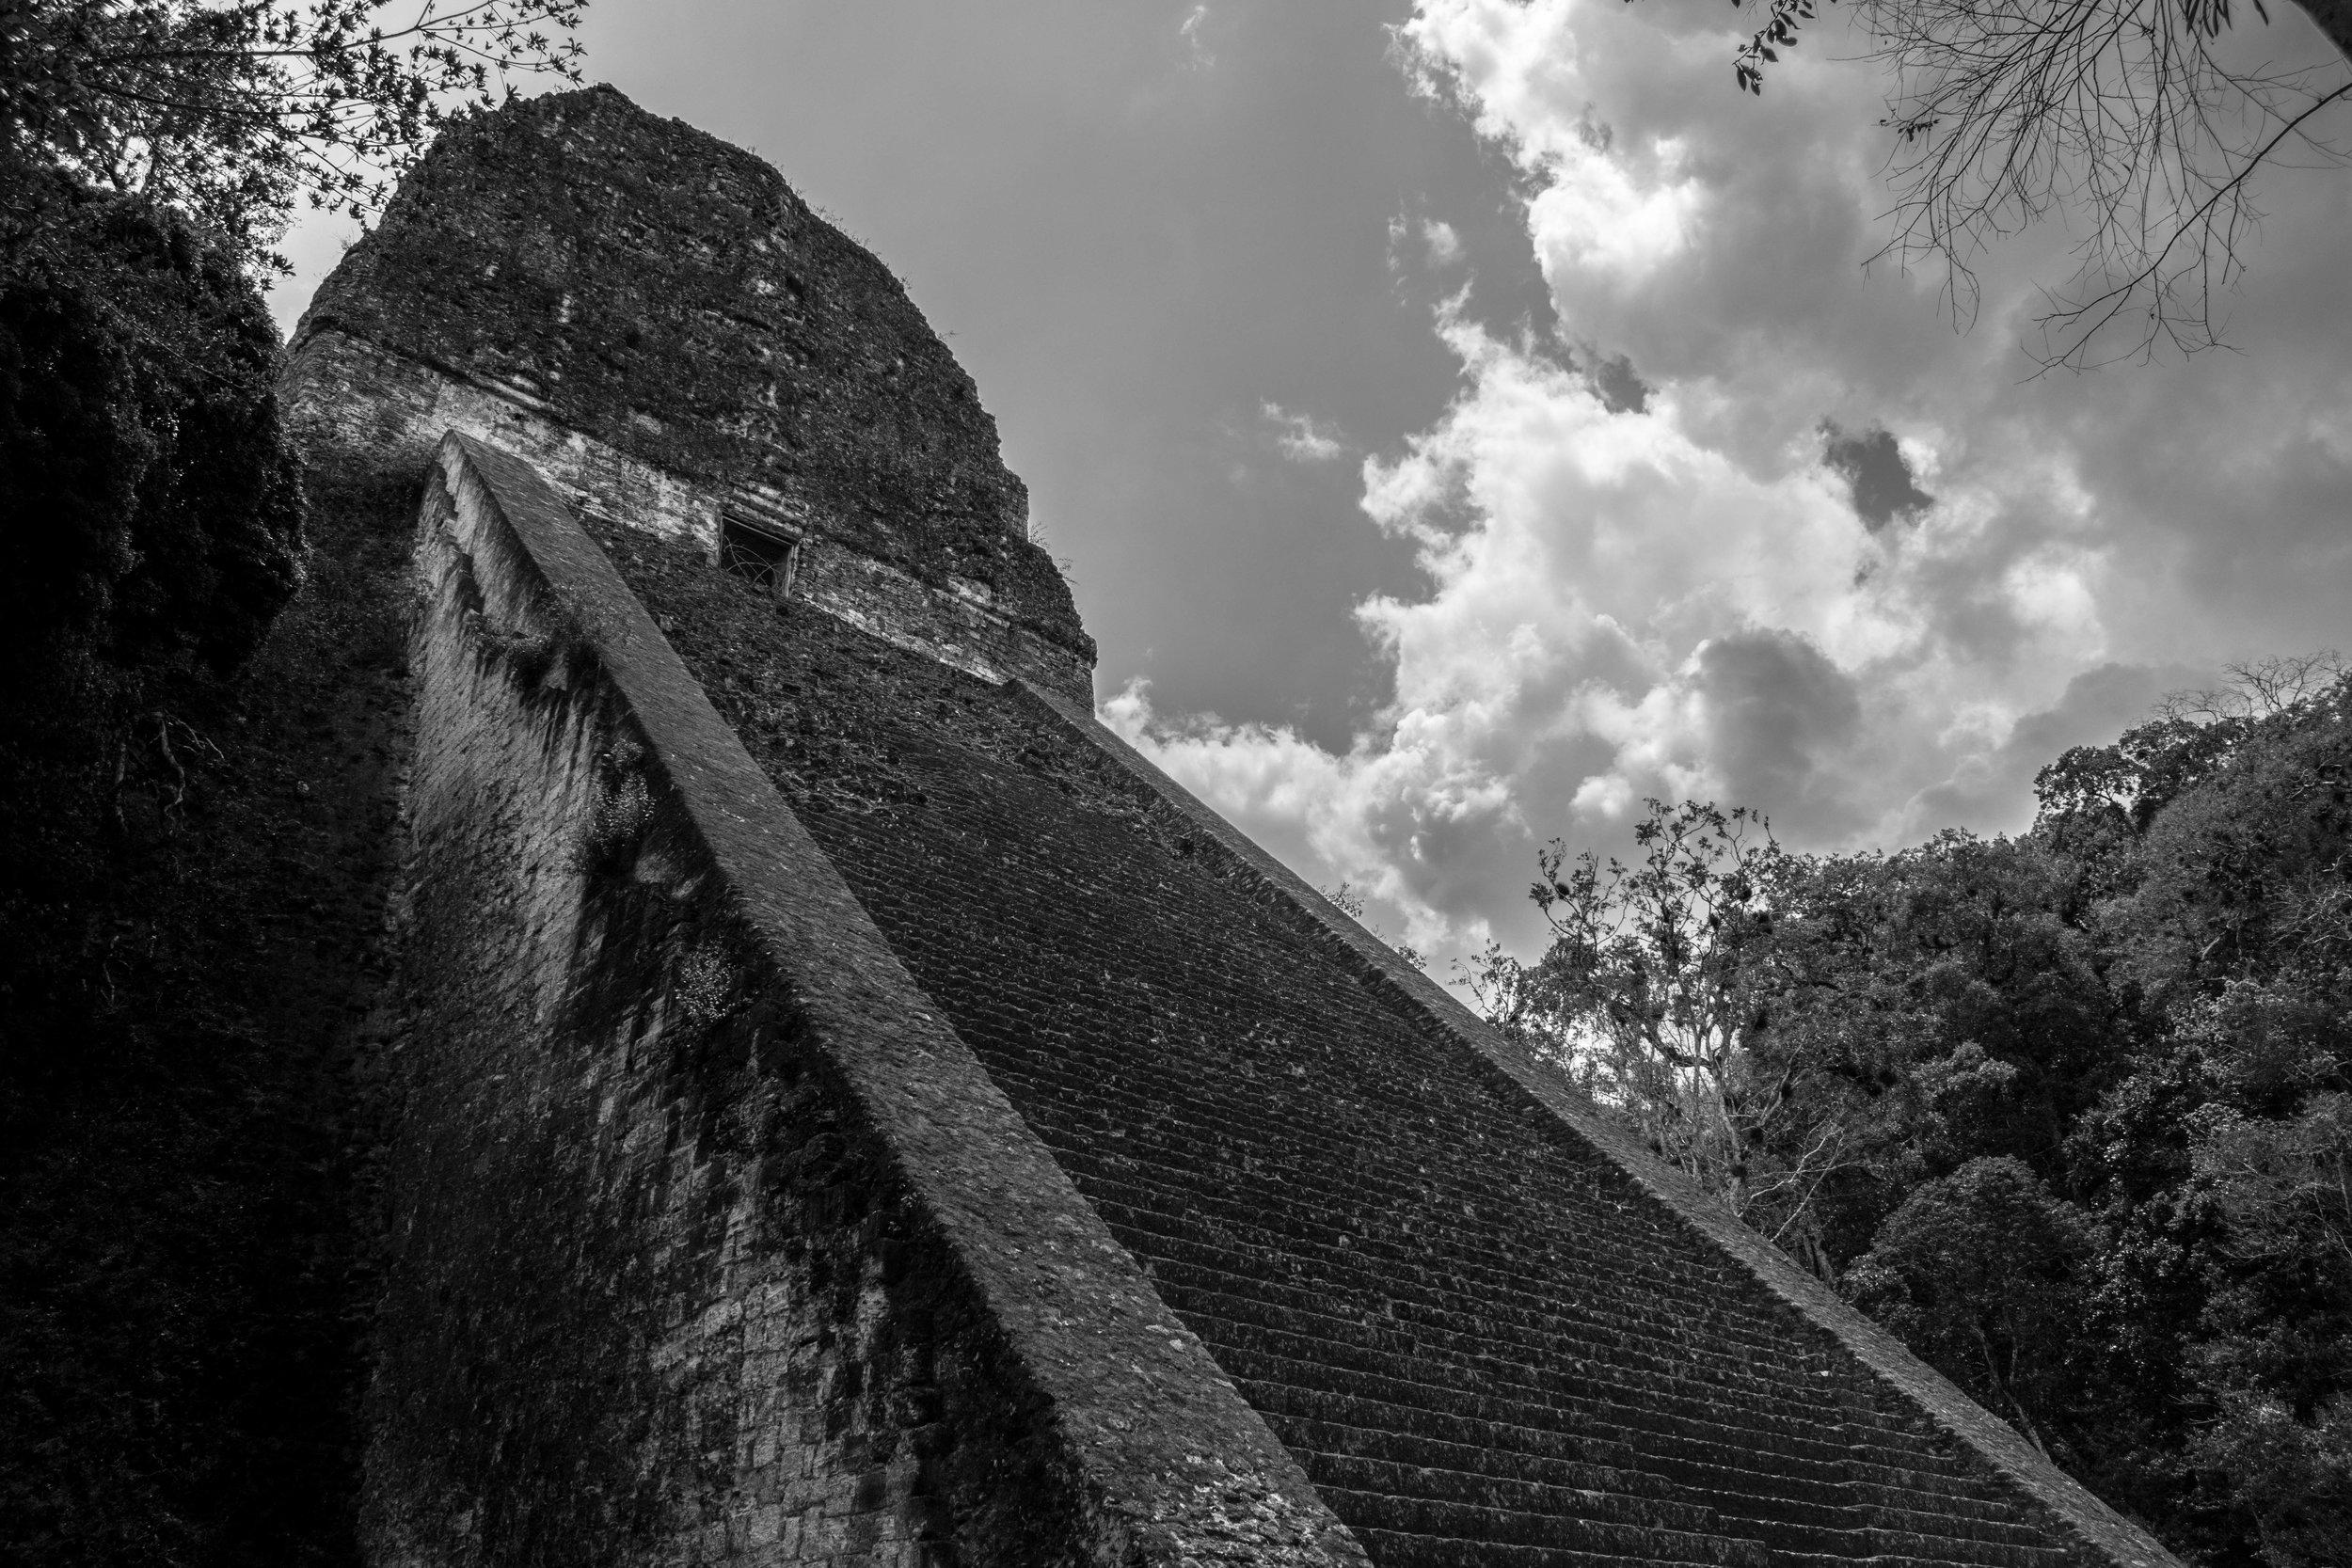 An Impressive Sky at Tikal in Guatemala